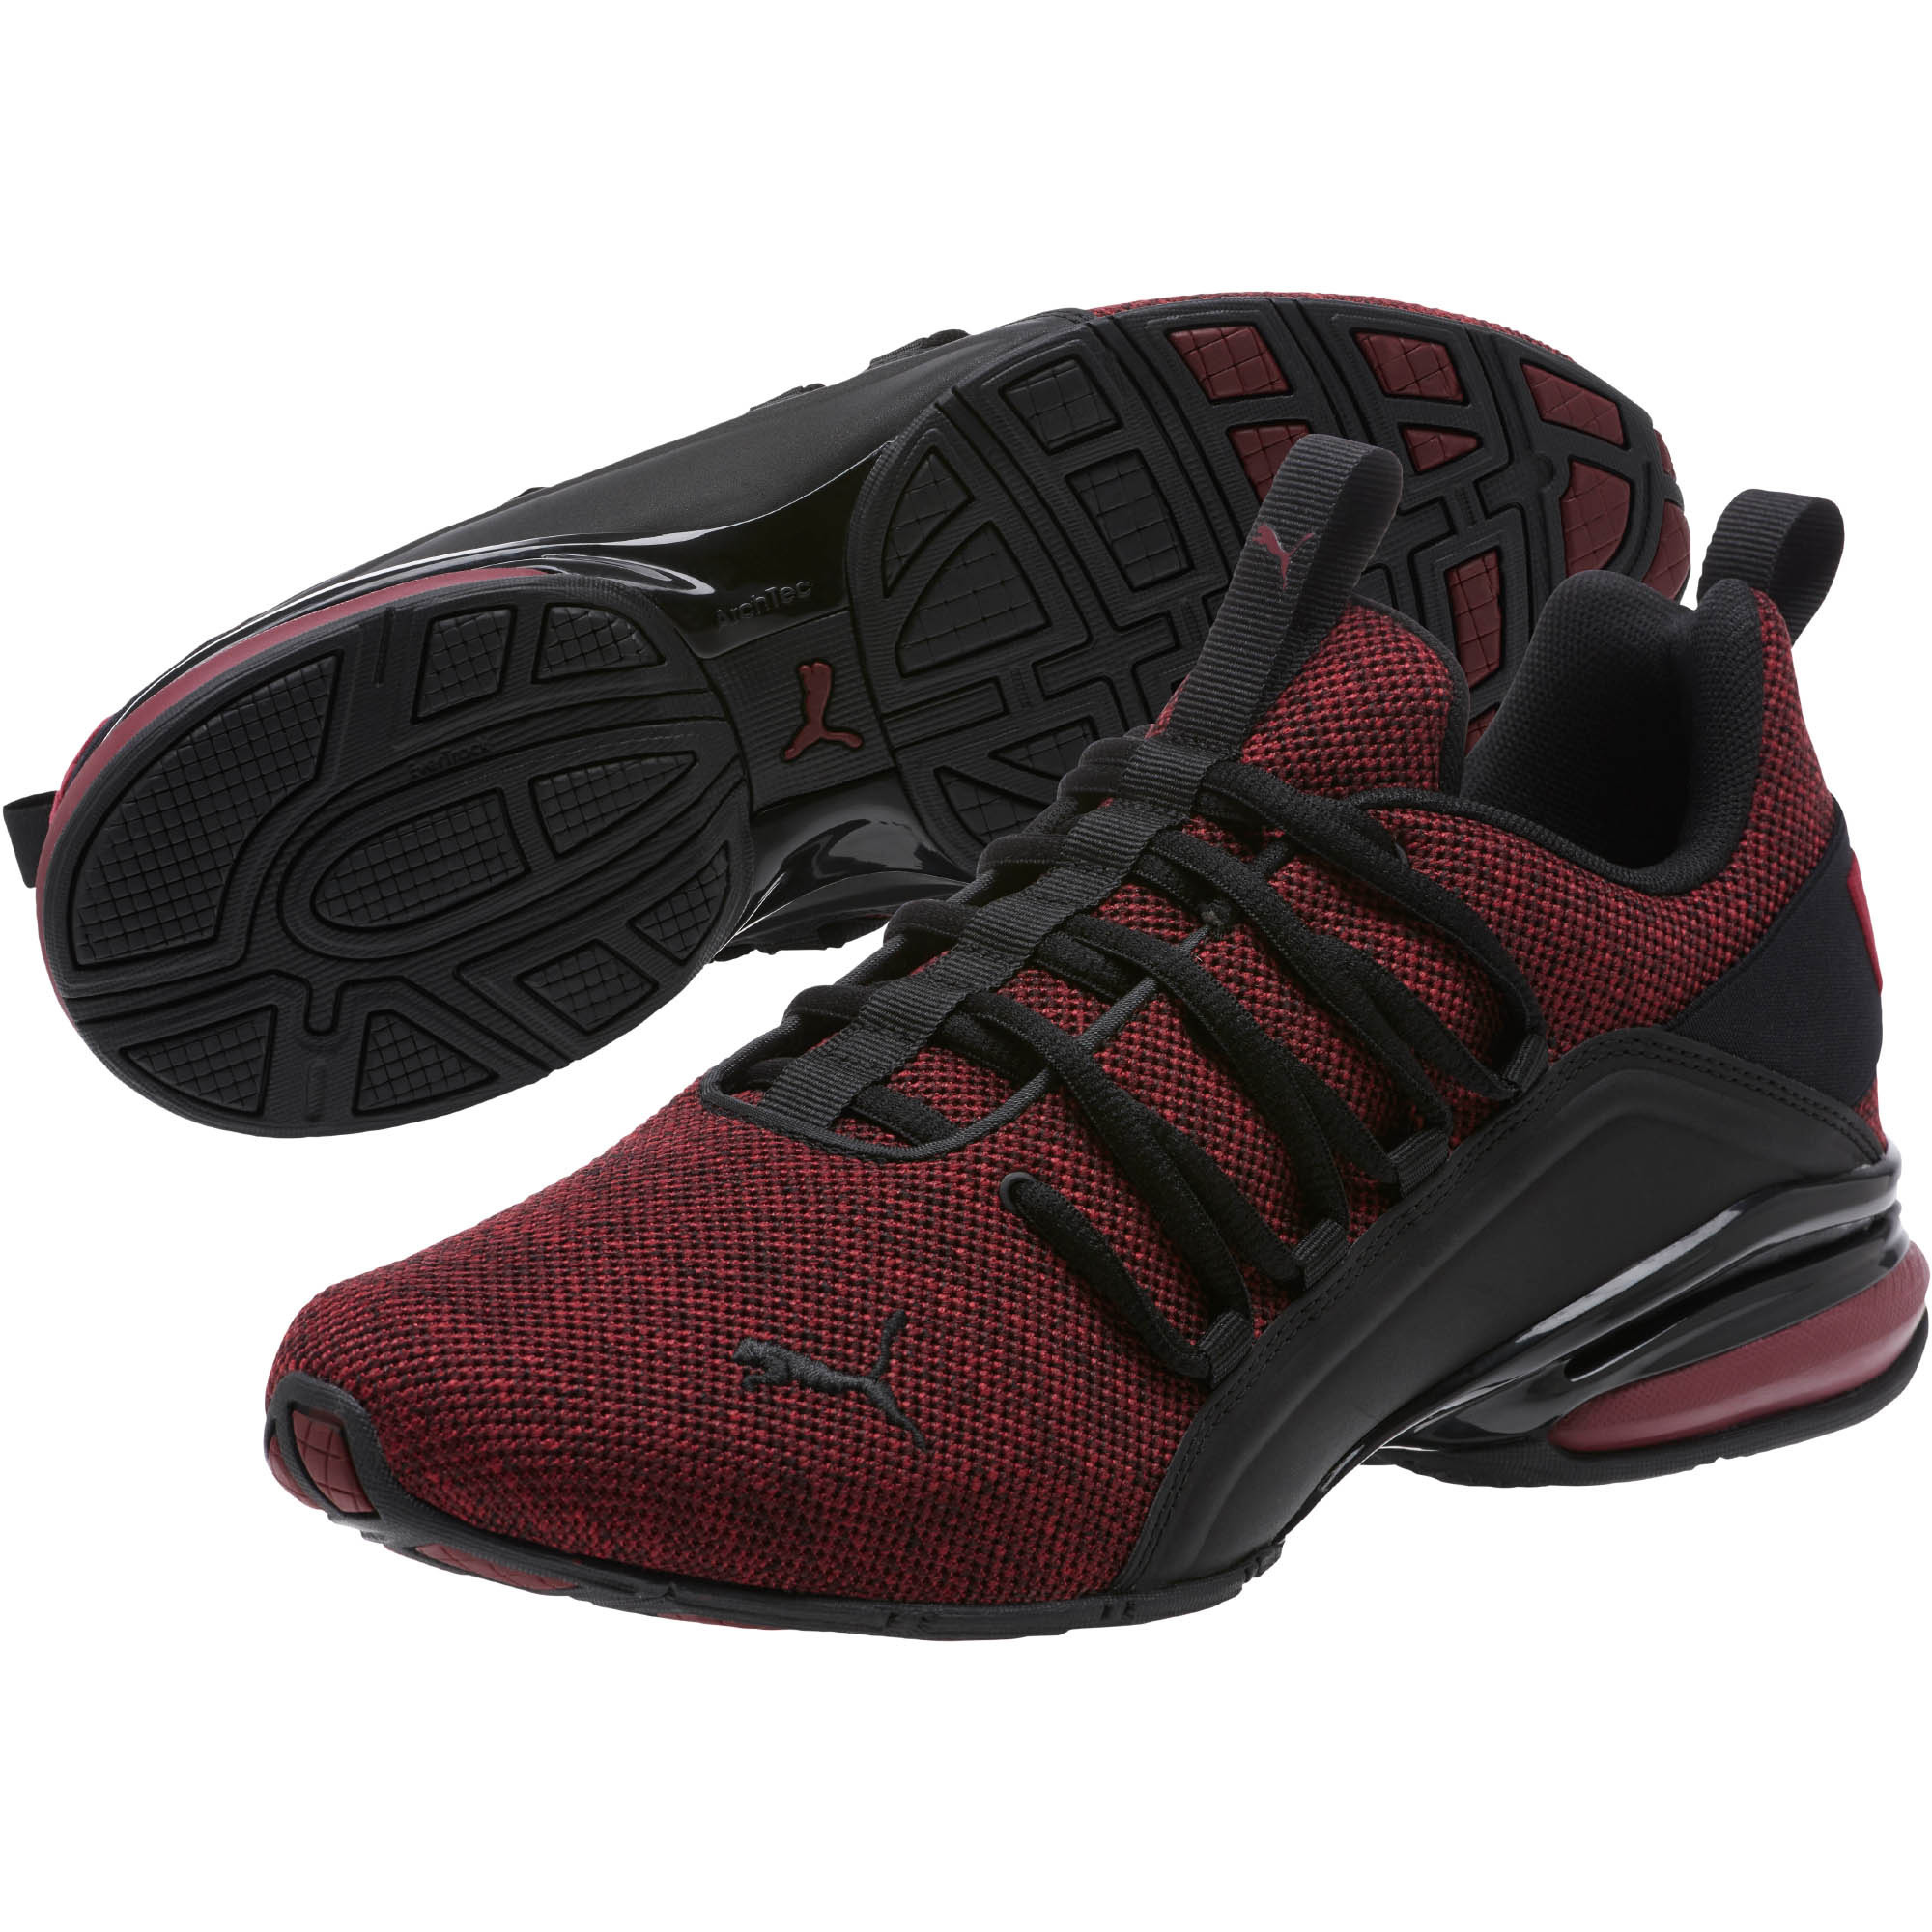 PUMA-Axelion-Men-039-s-Training-Shoes-Men-Shoe-Running thumbnail 28